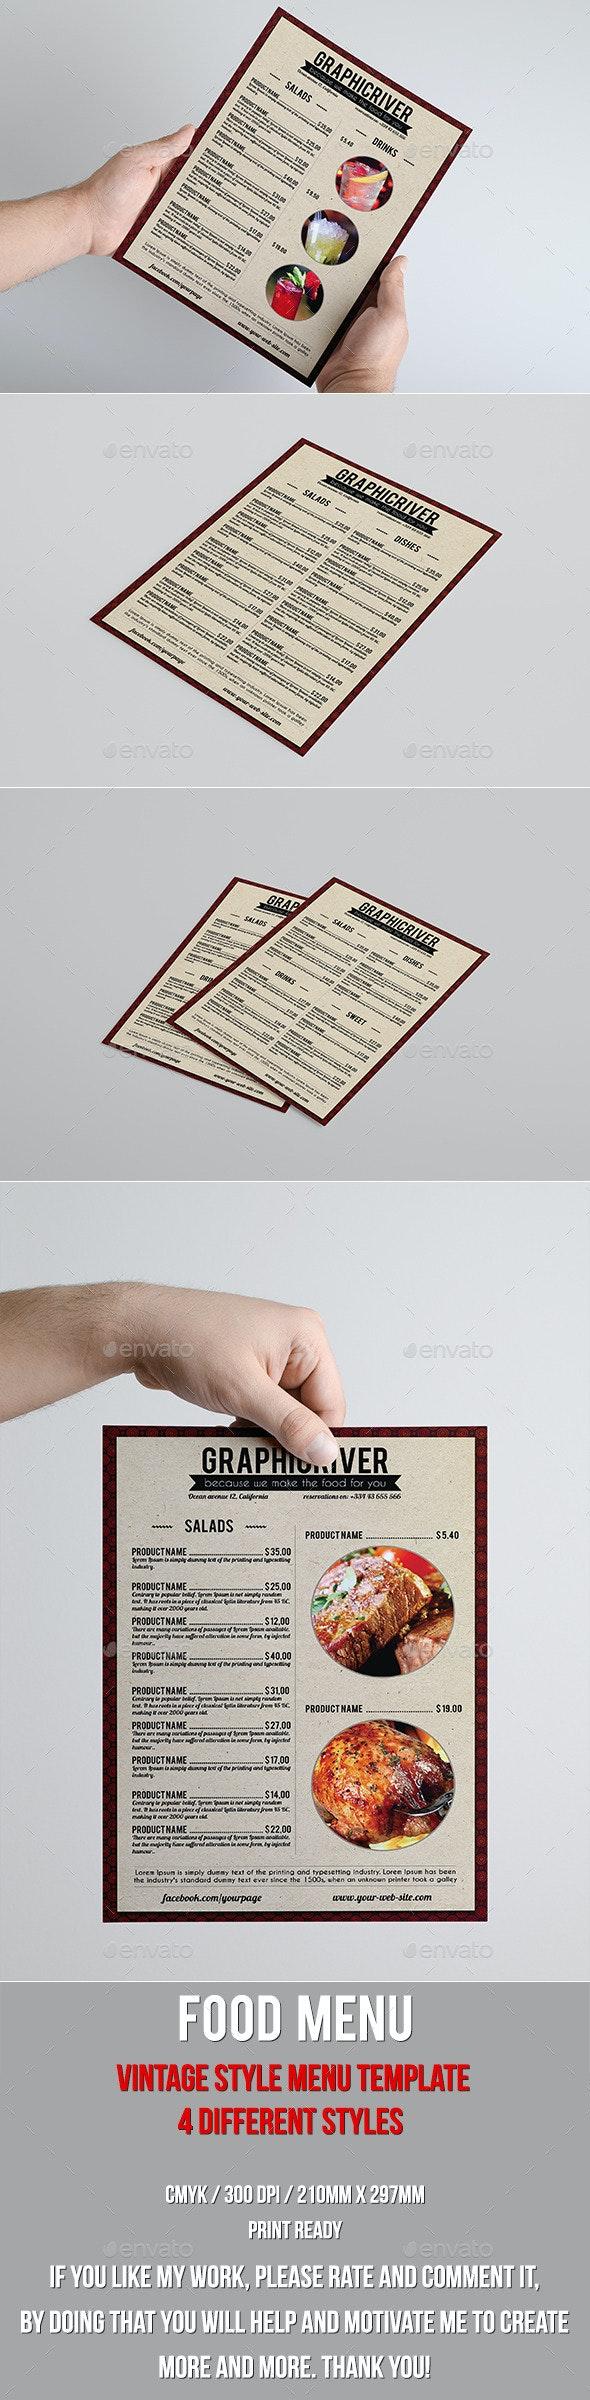 Vintage food menu - Food Menus Print Templates